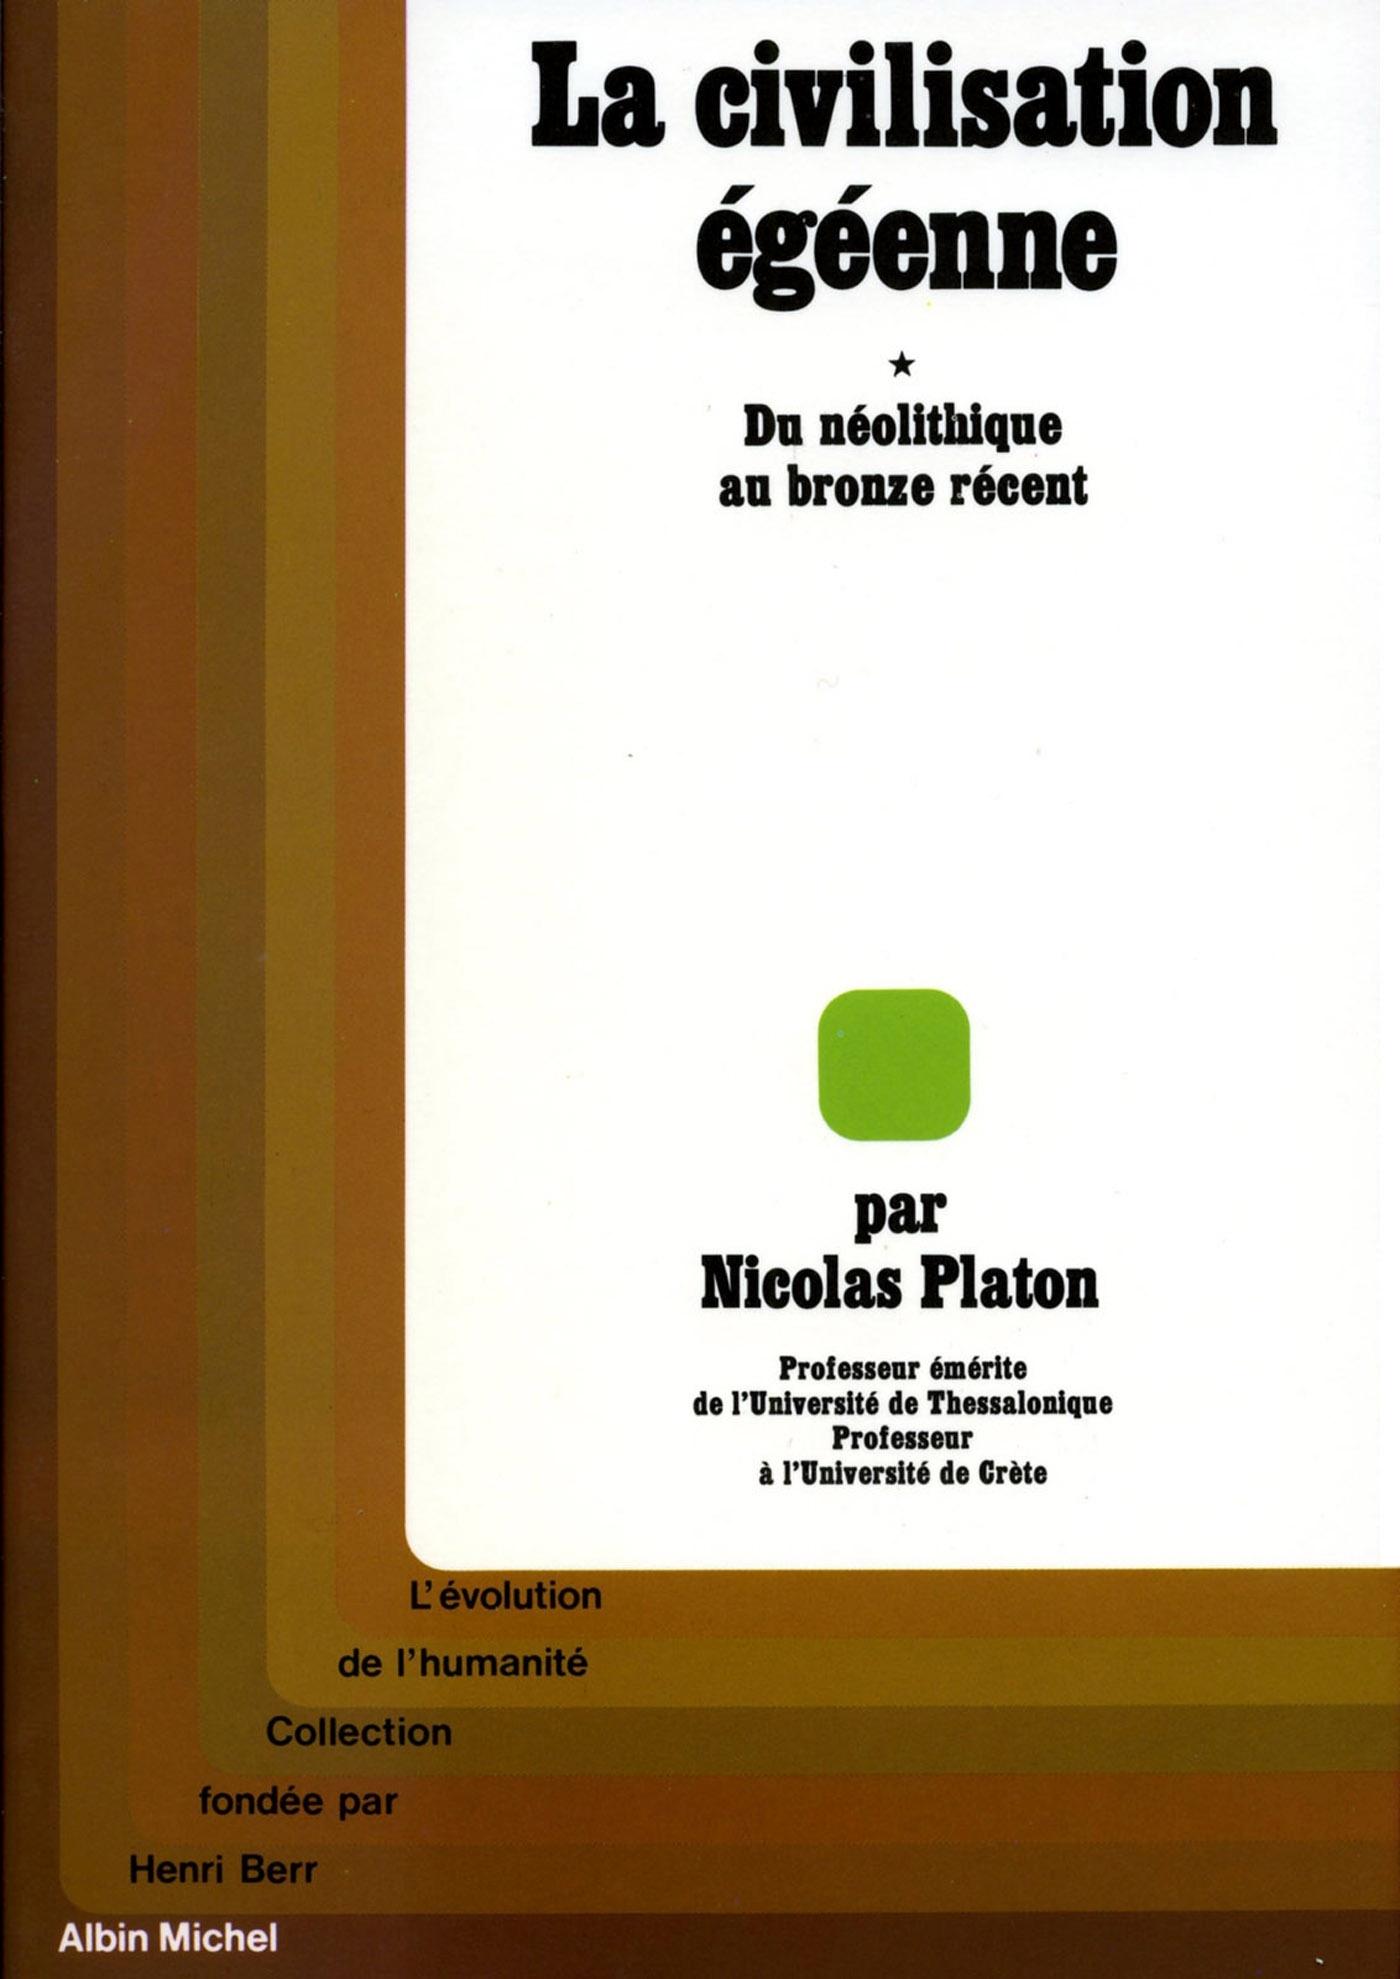 LA CIVILISATION EGEENNE - TOME 1